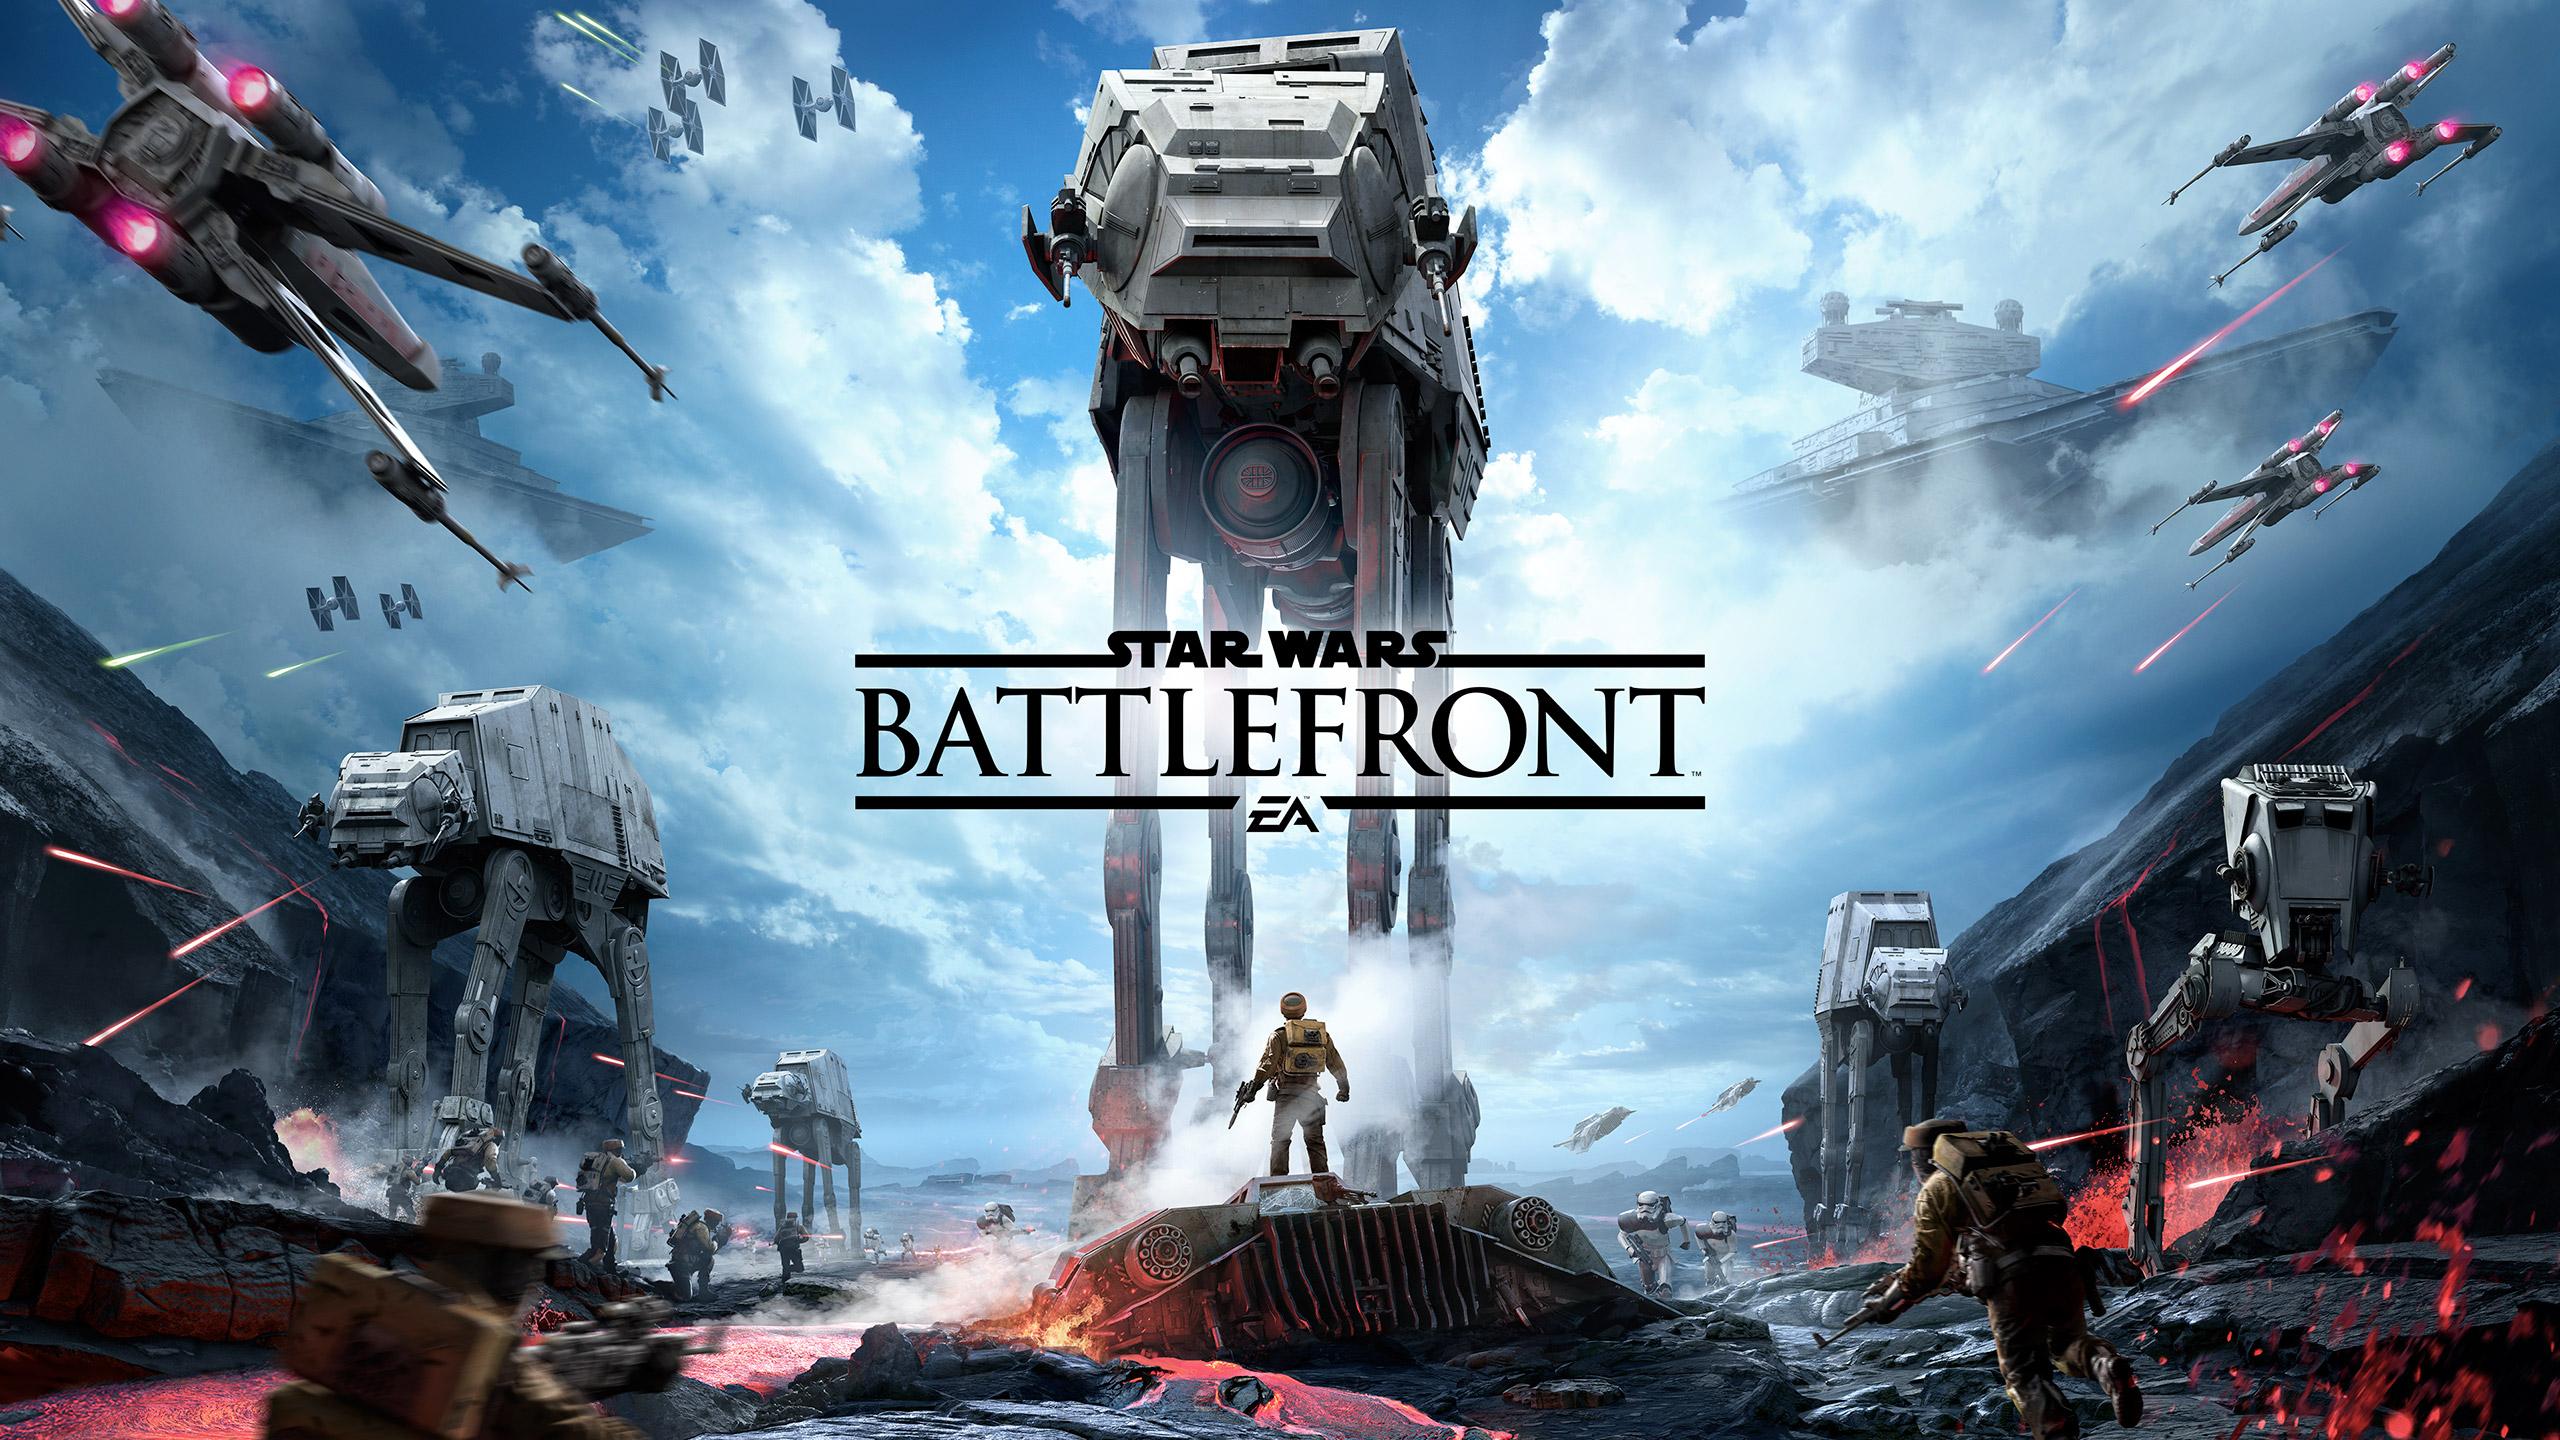 Photo of Prueba de Star Wars Battlefront lista para mañana